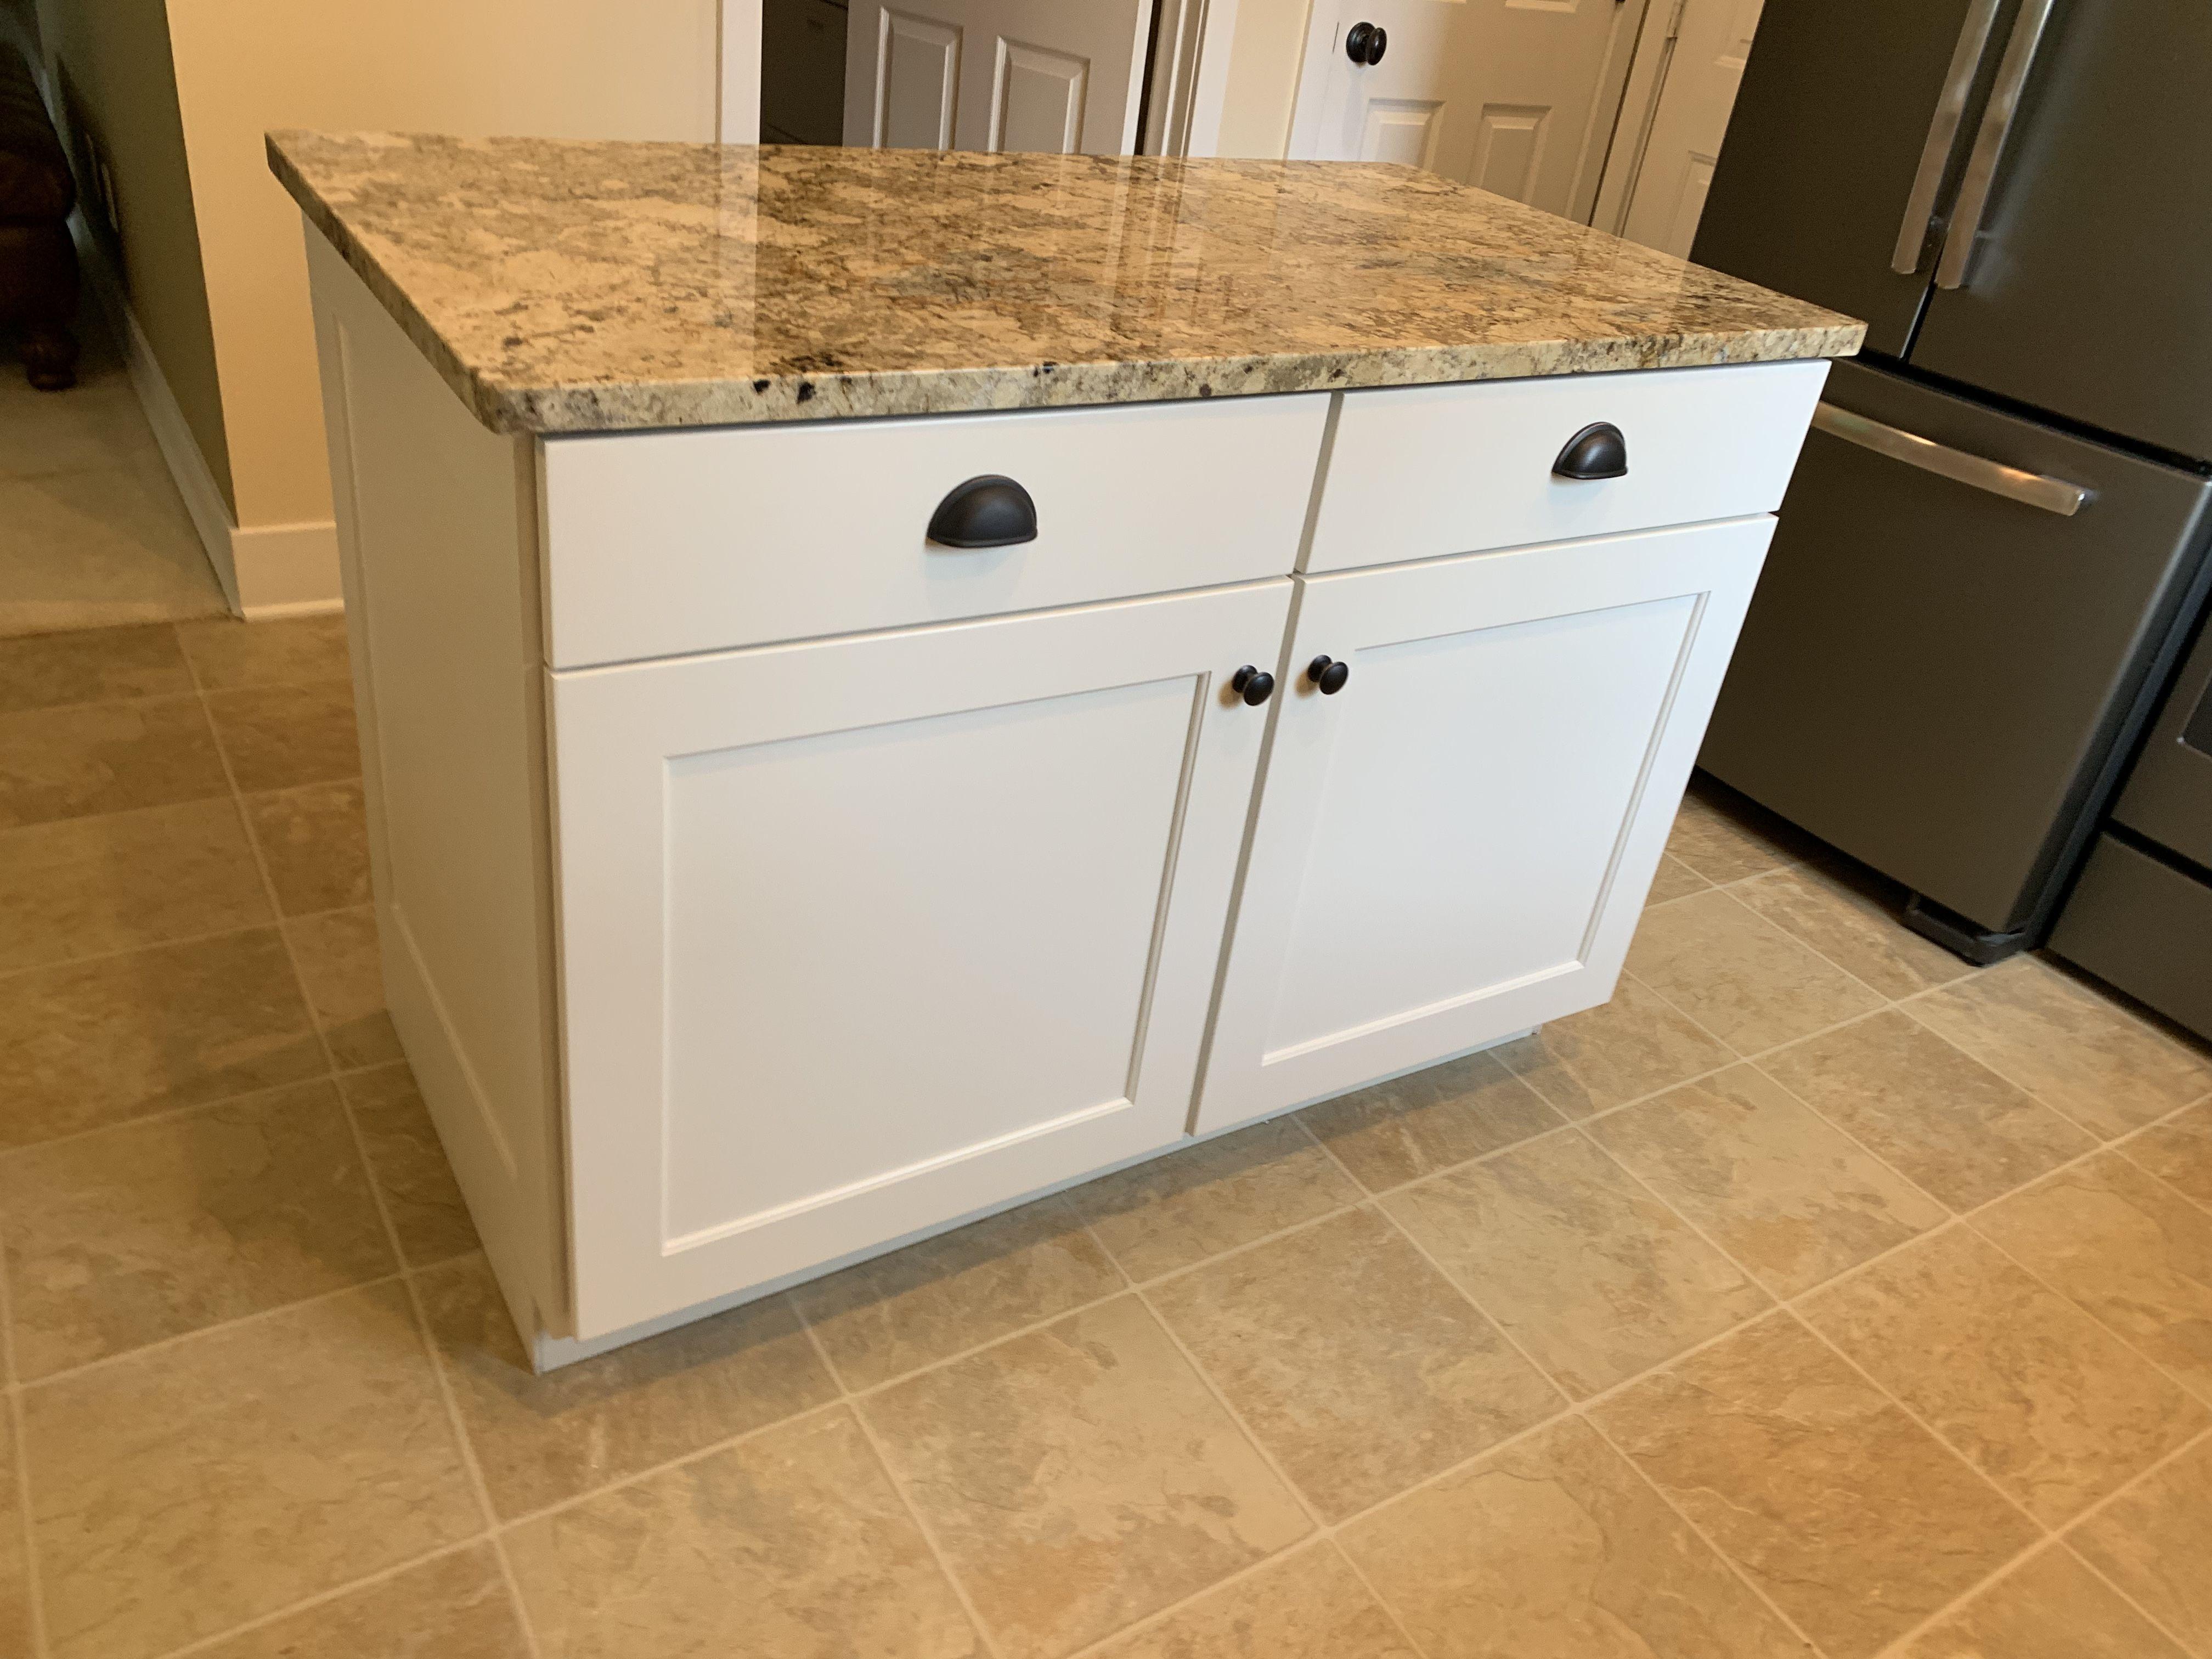 Kitchen Cabinet Refacing Grand Rapids Mi Kitchen Tune Up Grand Rapids, MI   Refacing   Cabirefacing